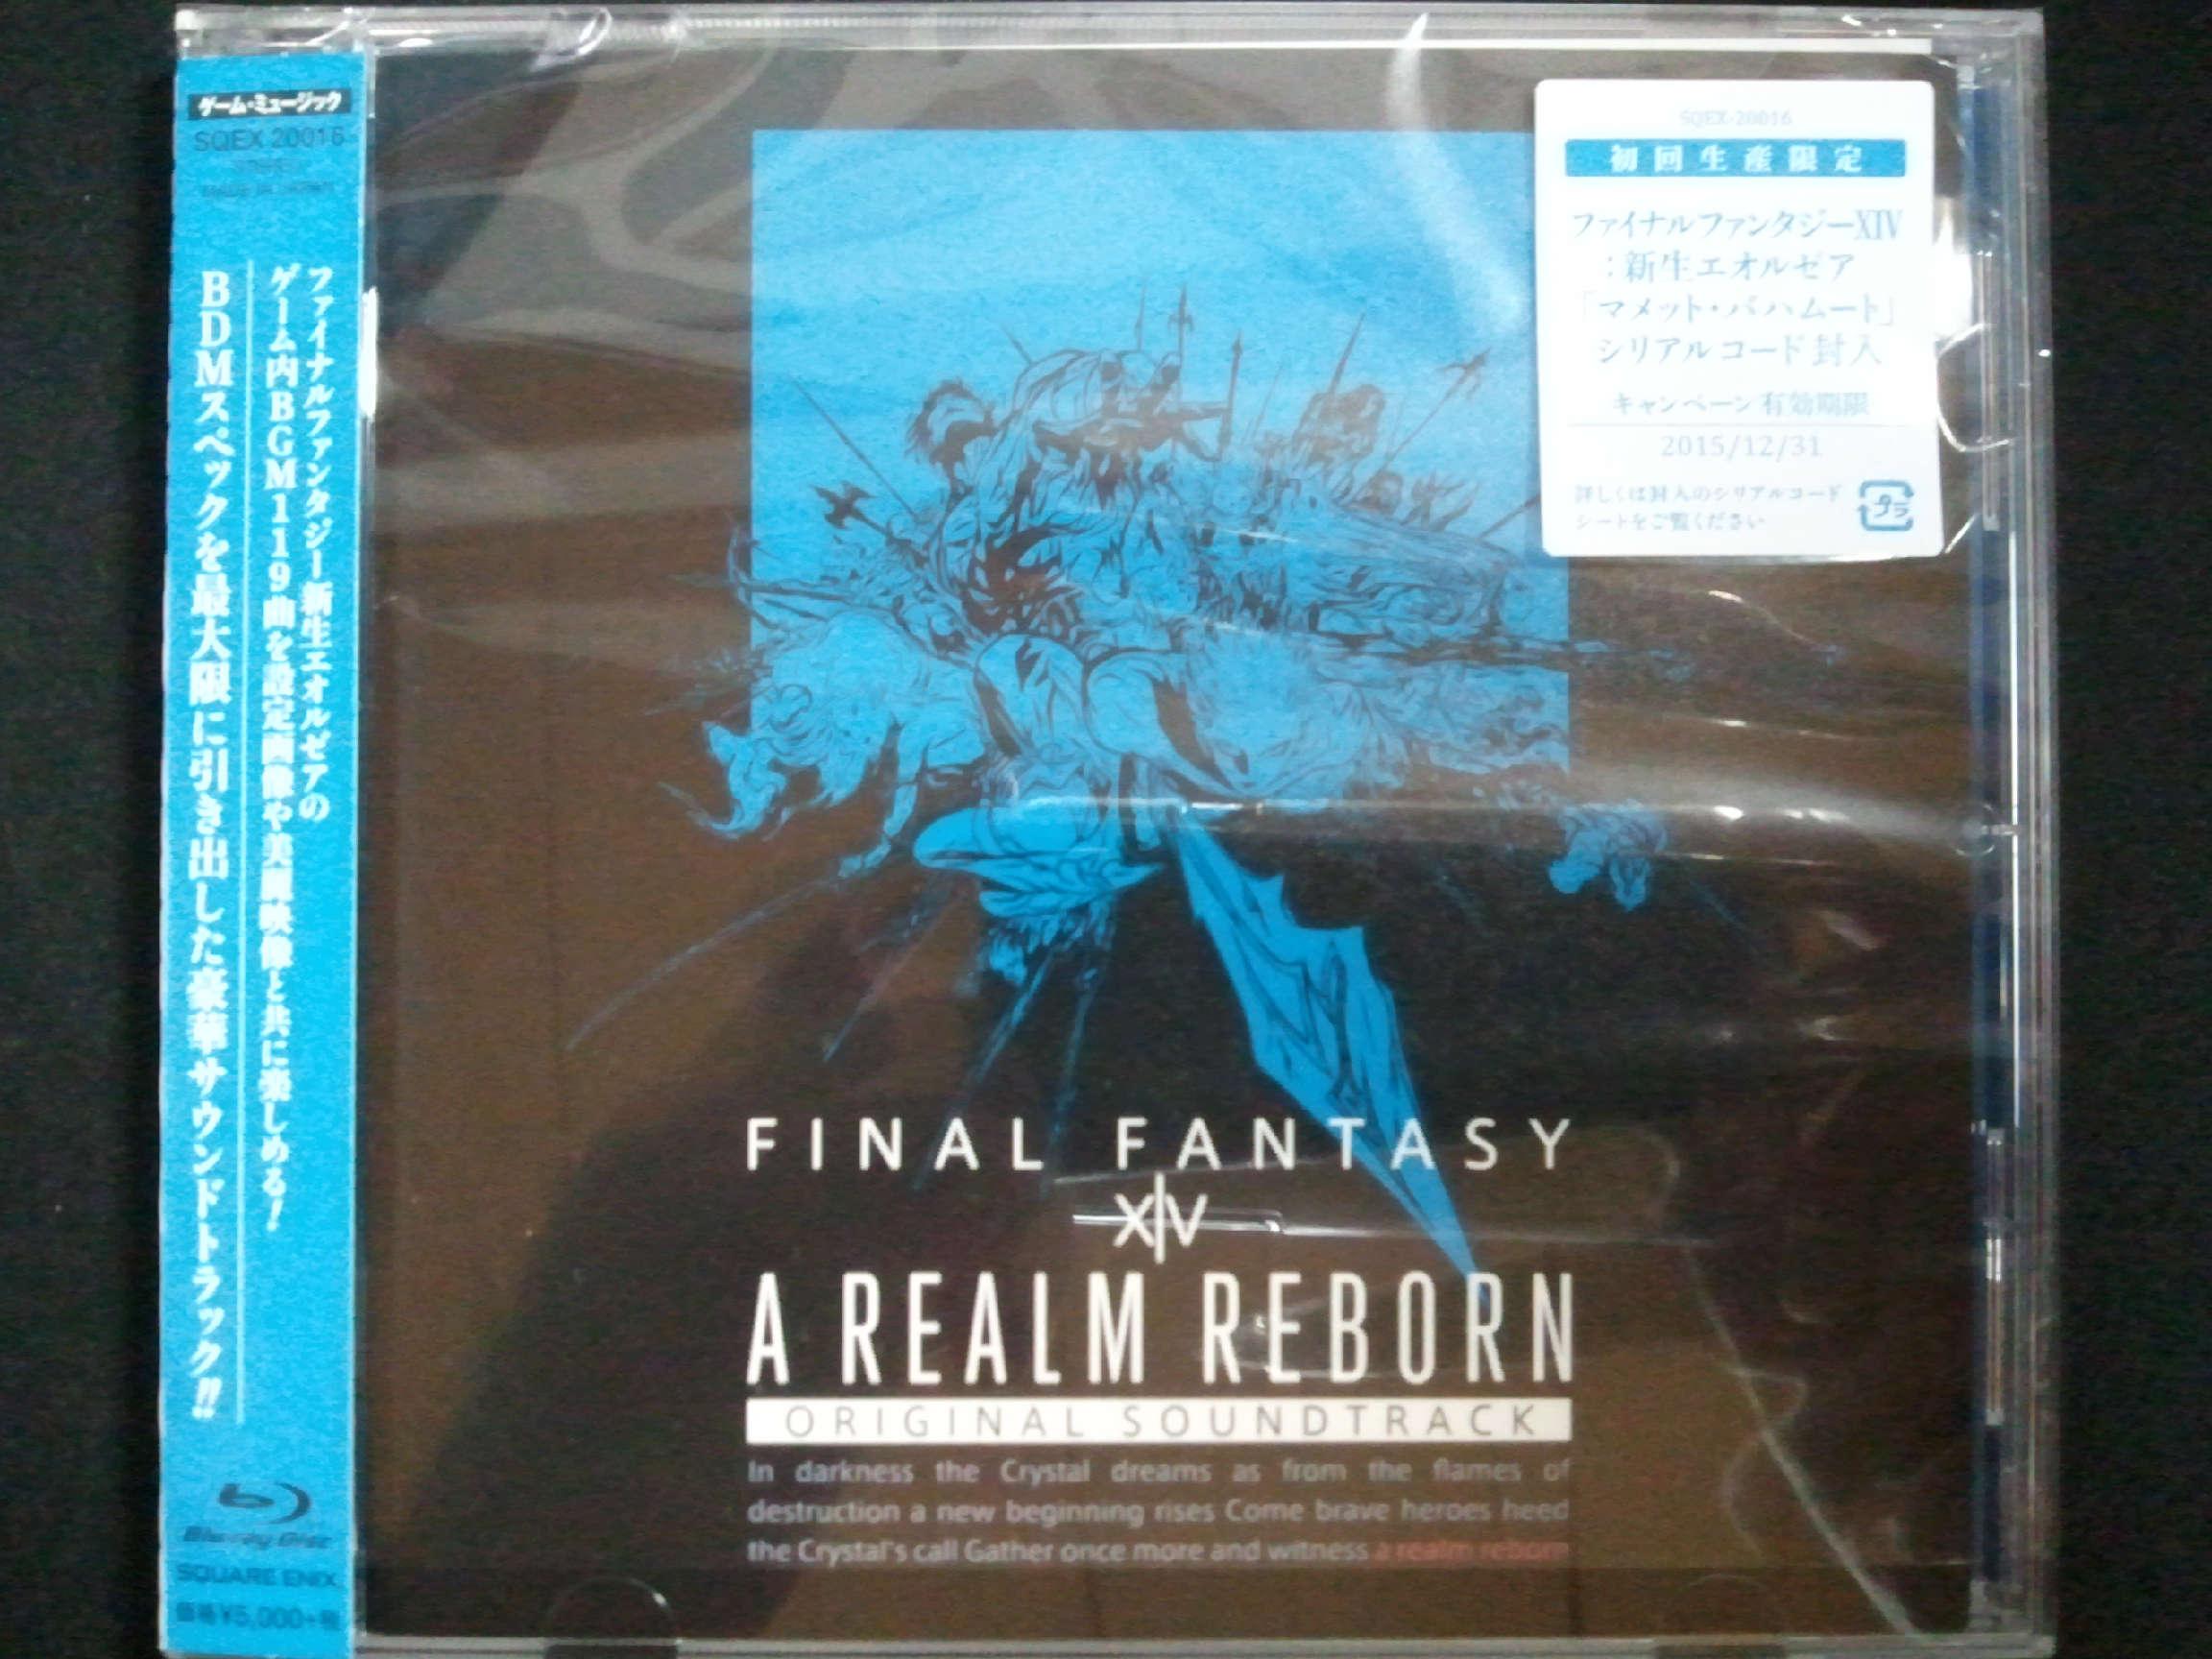 FINAL FANTASY XIV A Realm Reborn OST